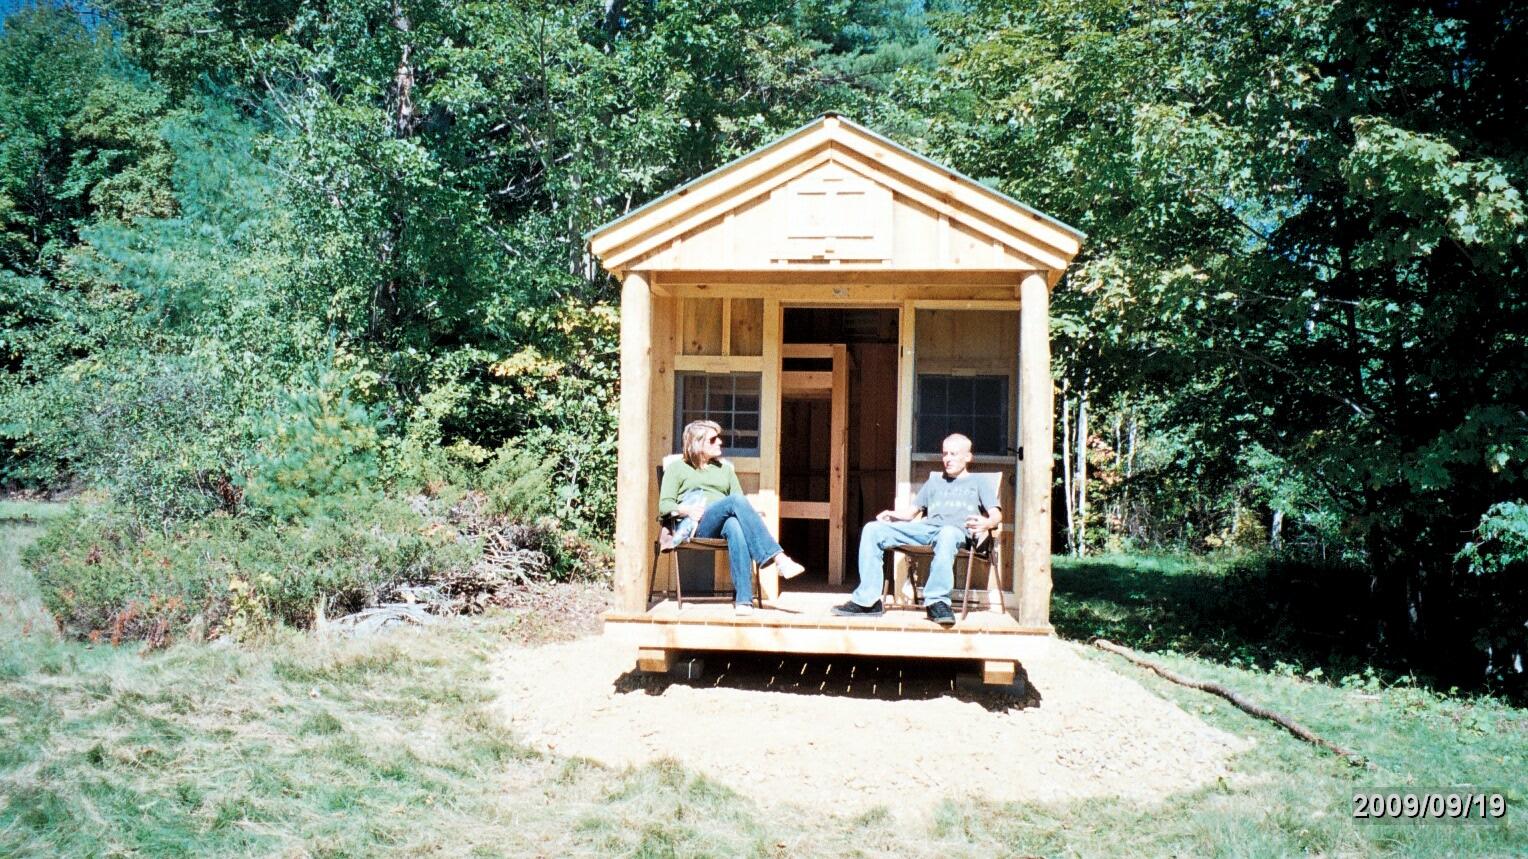 Relaxshacks.com: The Jamaica Cottage Shop- TEN AWESOME